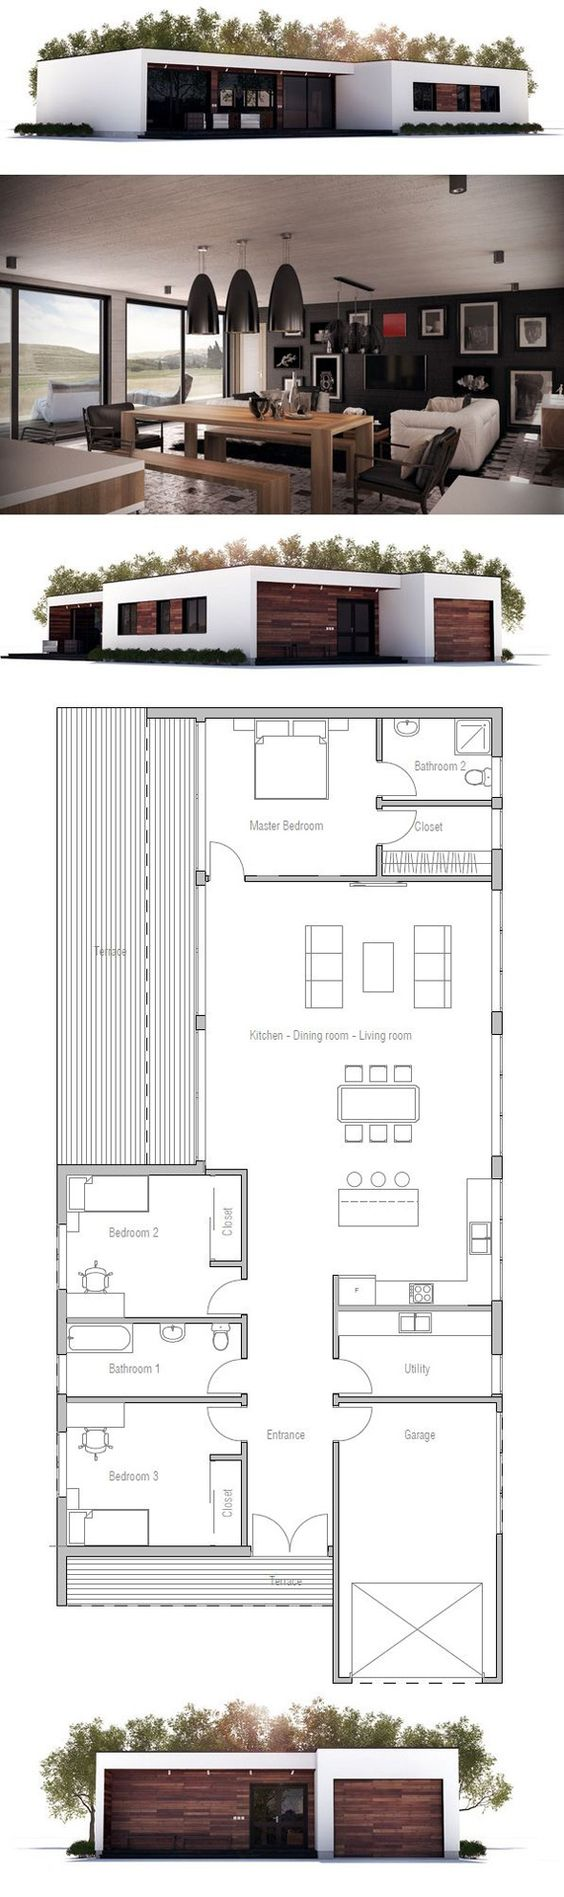 Planta de casa casas pinterest - Small narrow house plans minimalist ...